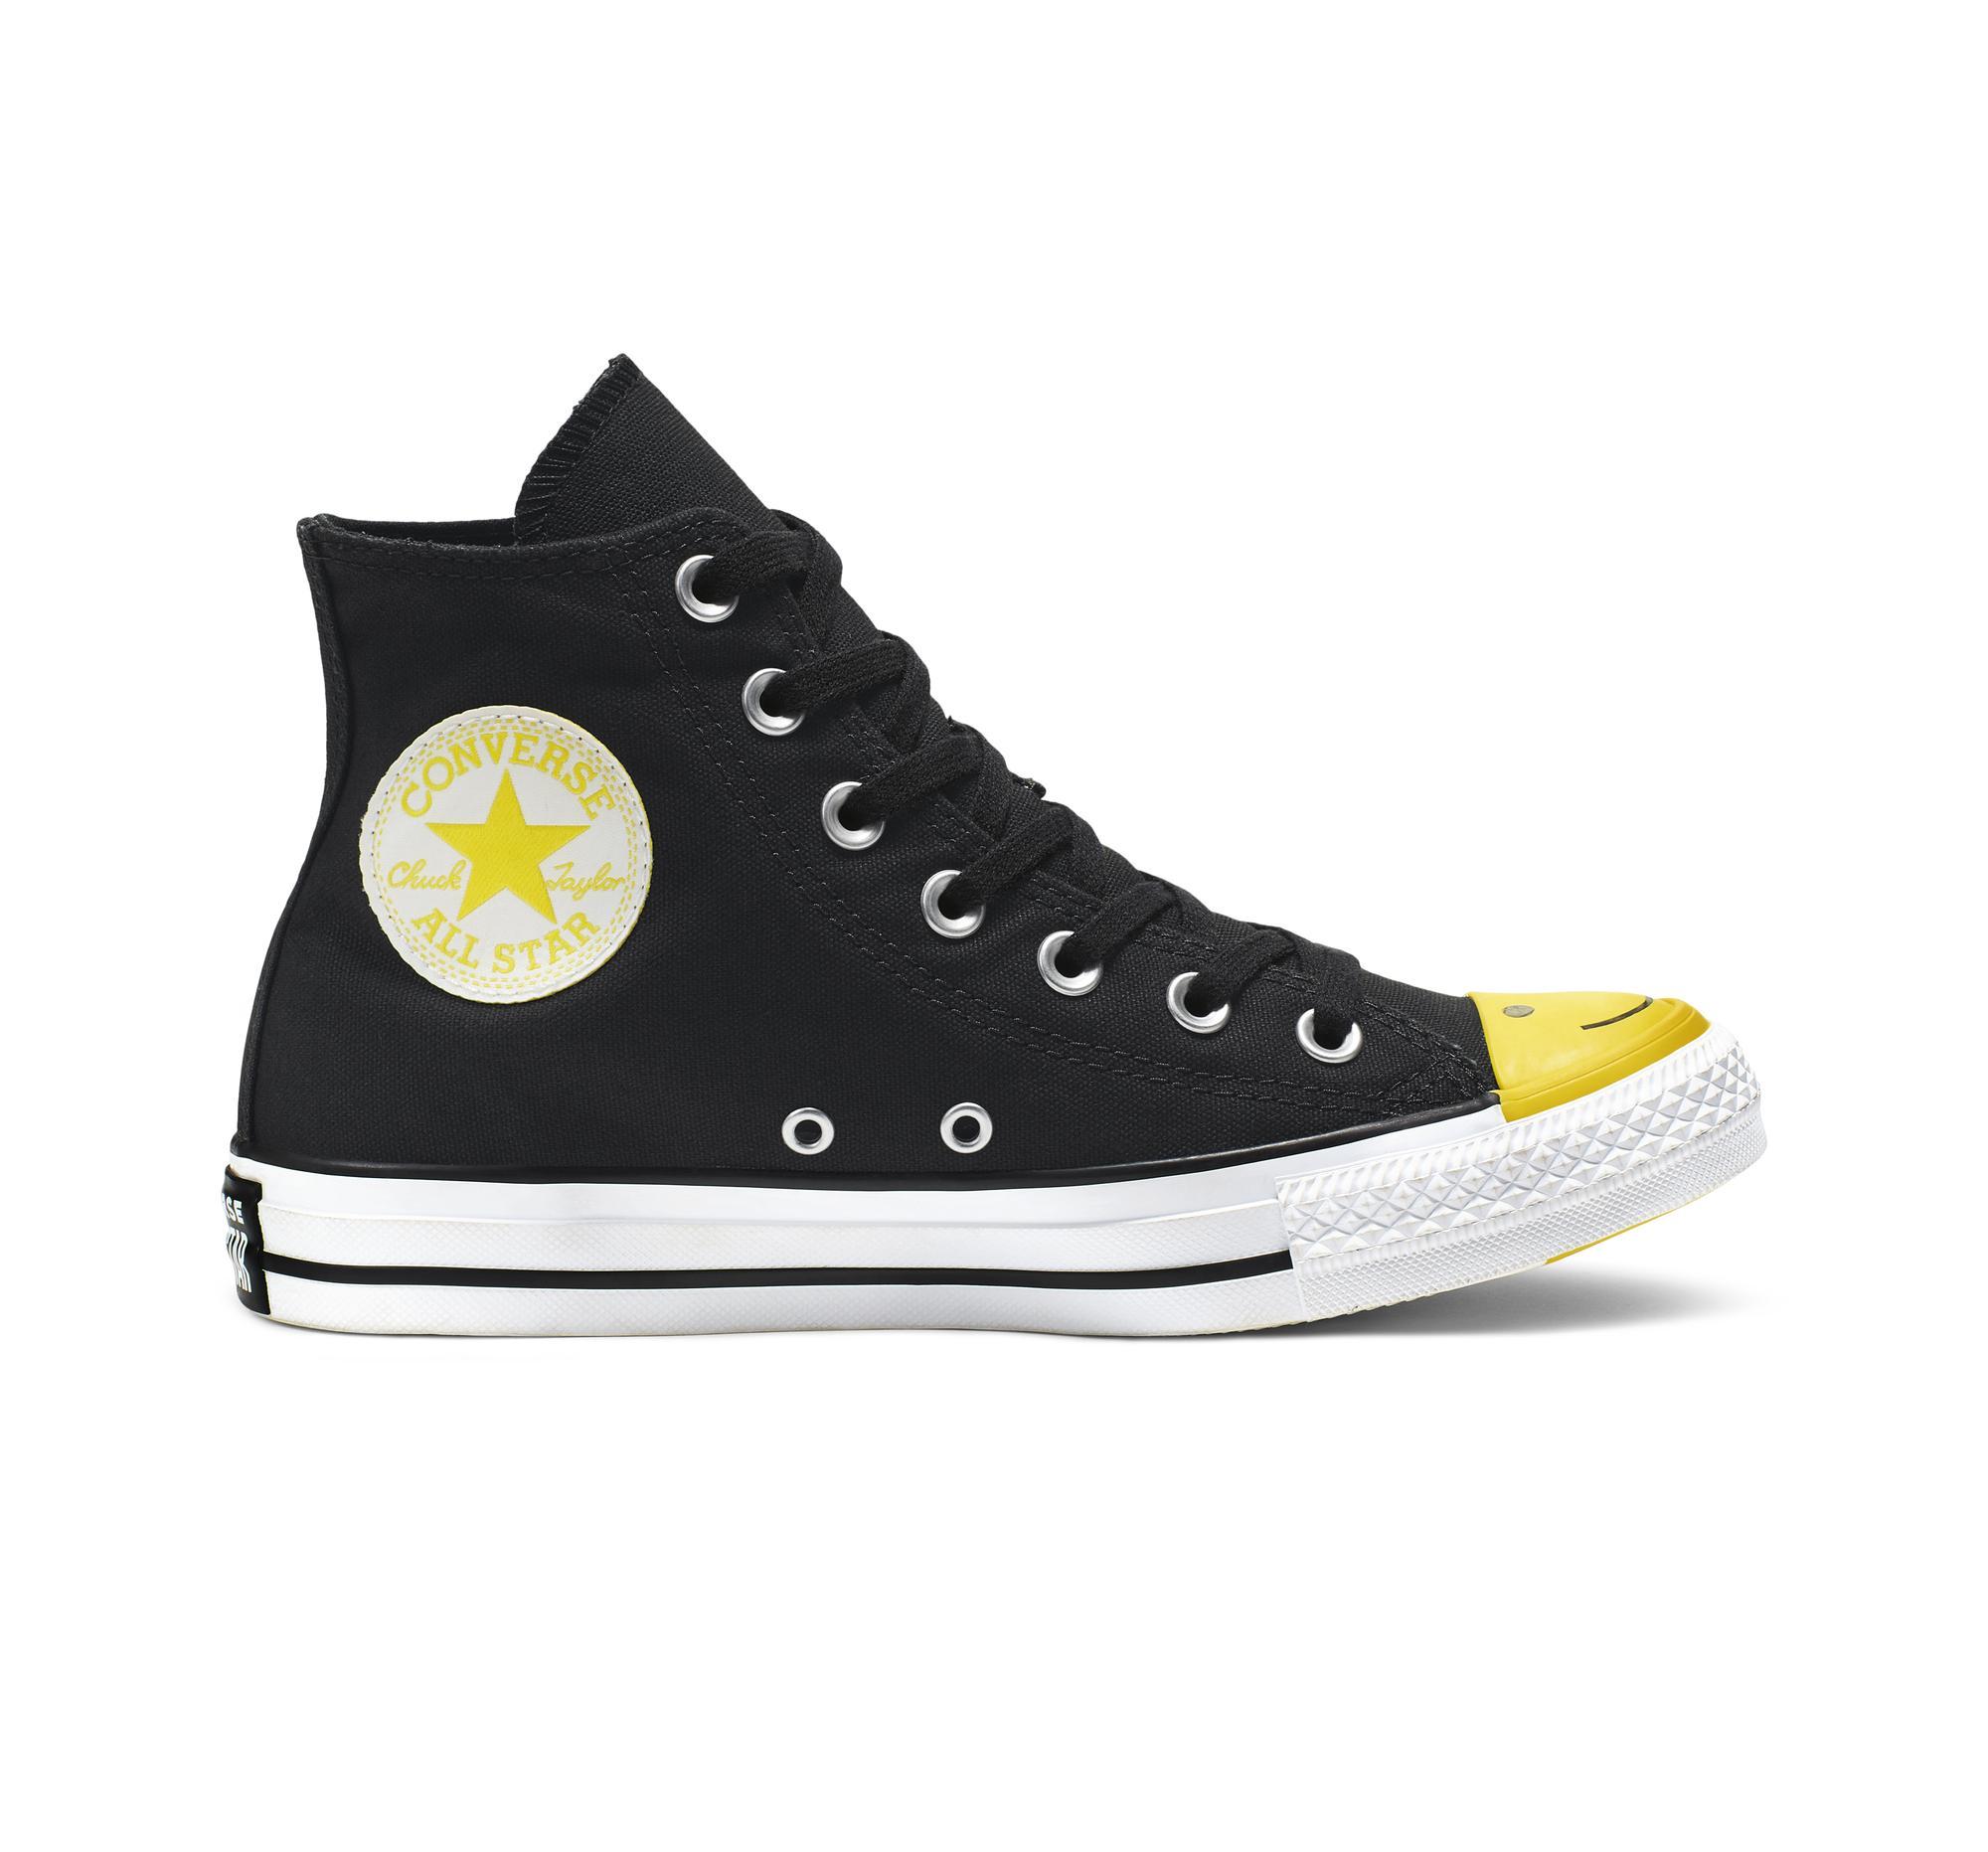 Converse Chuck Taylor All Star Carnival